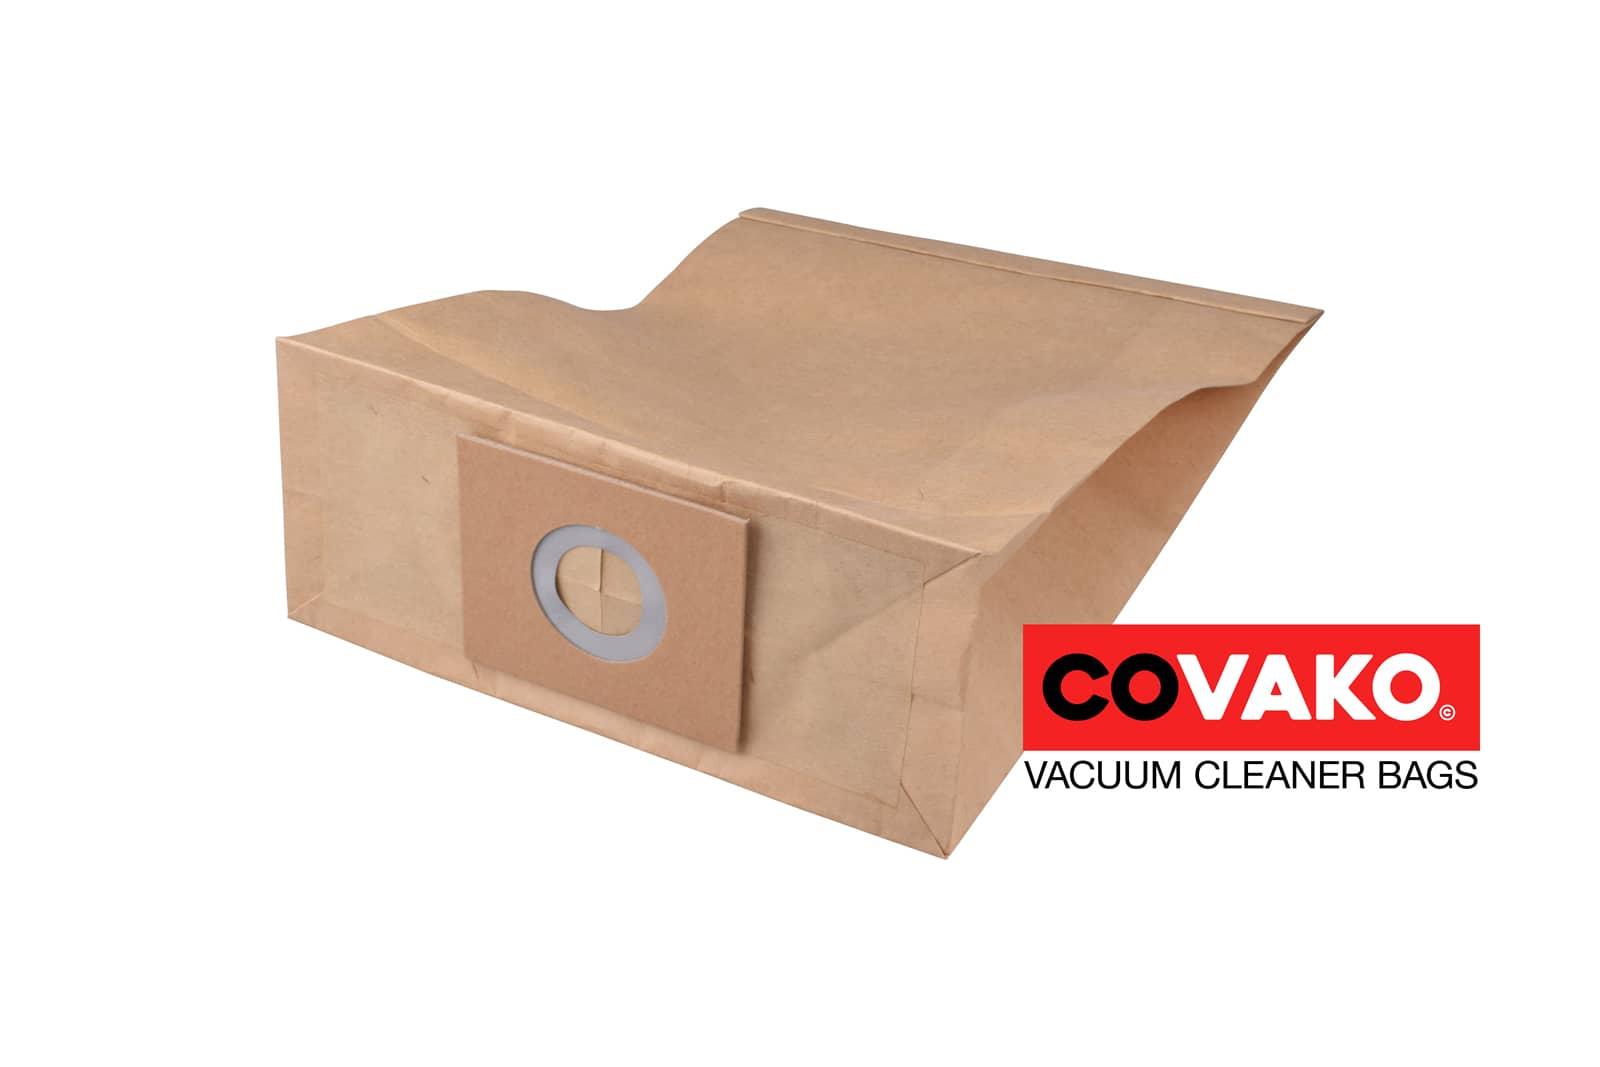 I-vac Dryver 10R / Papier - I-vac stofzuigerzakken